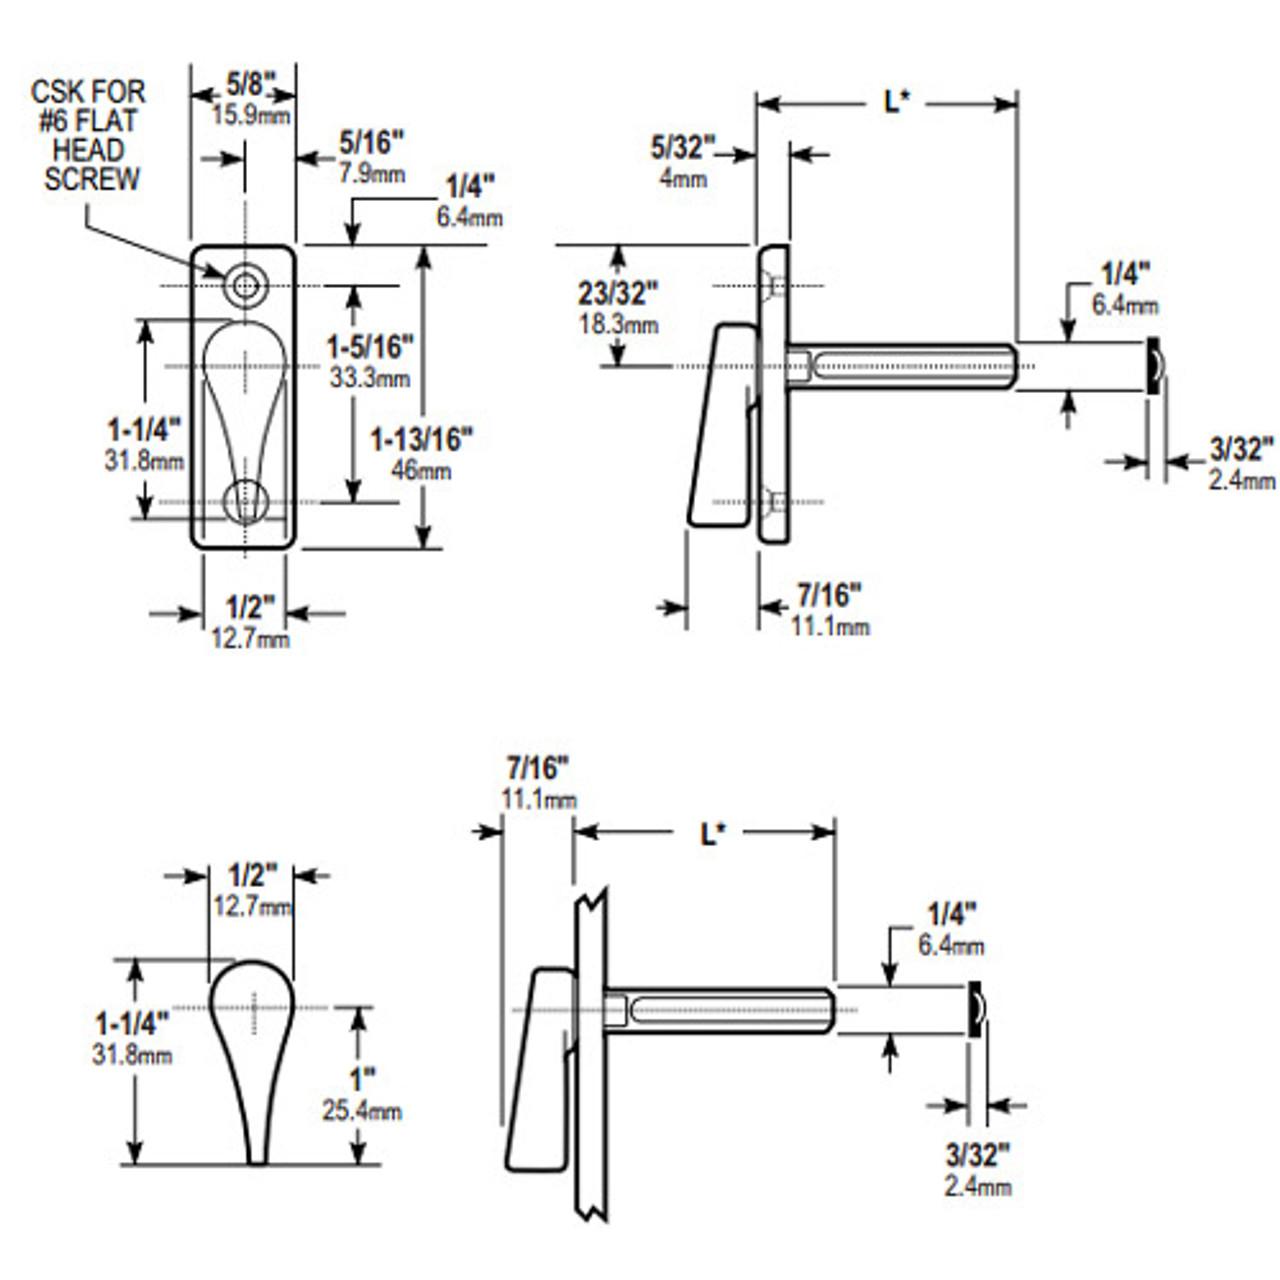 1000-01-32-119 Adams Rite 1000 Series Turns Dimensional View